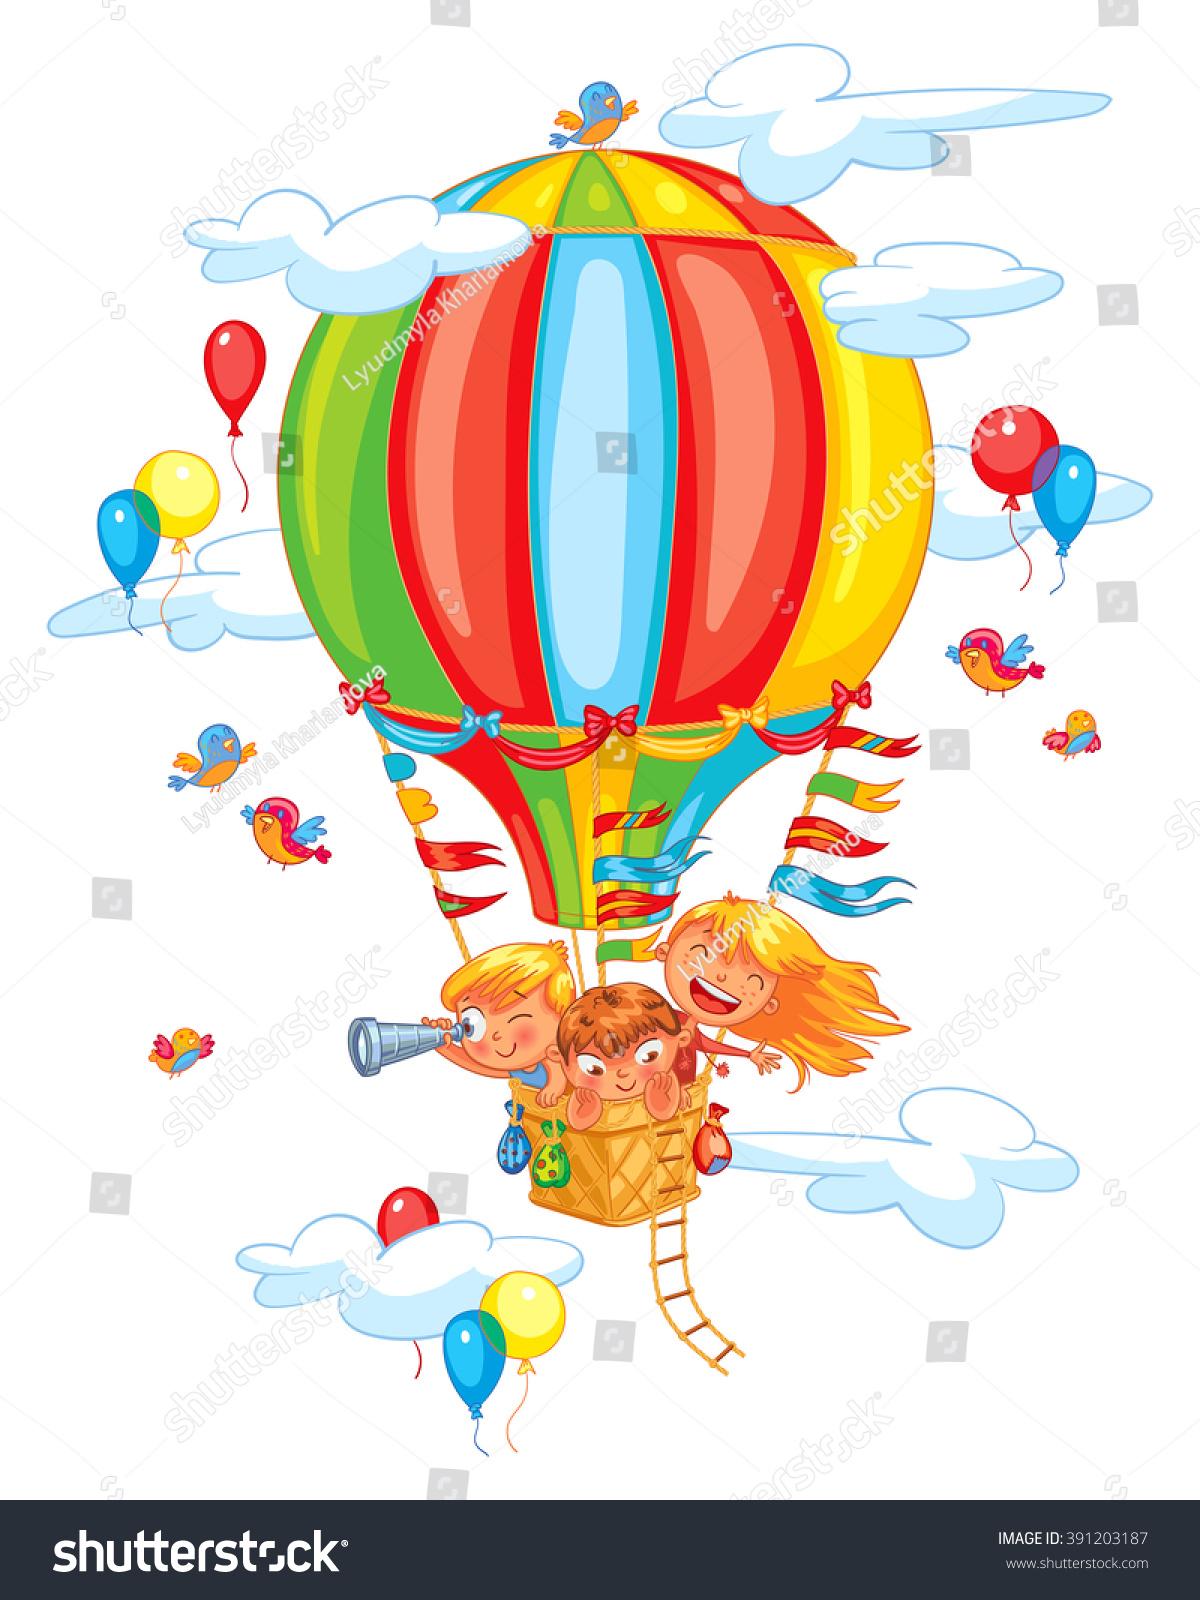 Cartoon Kids Riding Hot Air Balloon. Funny Cartoon ...